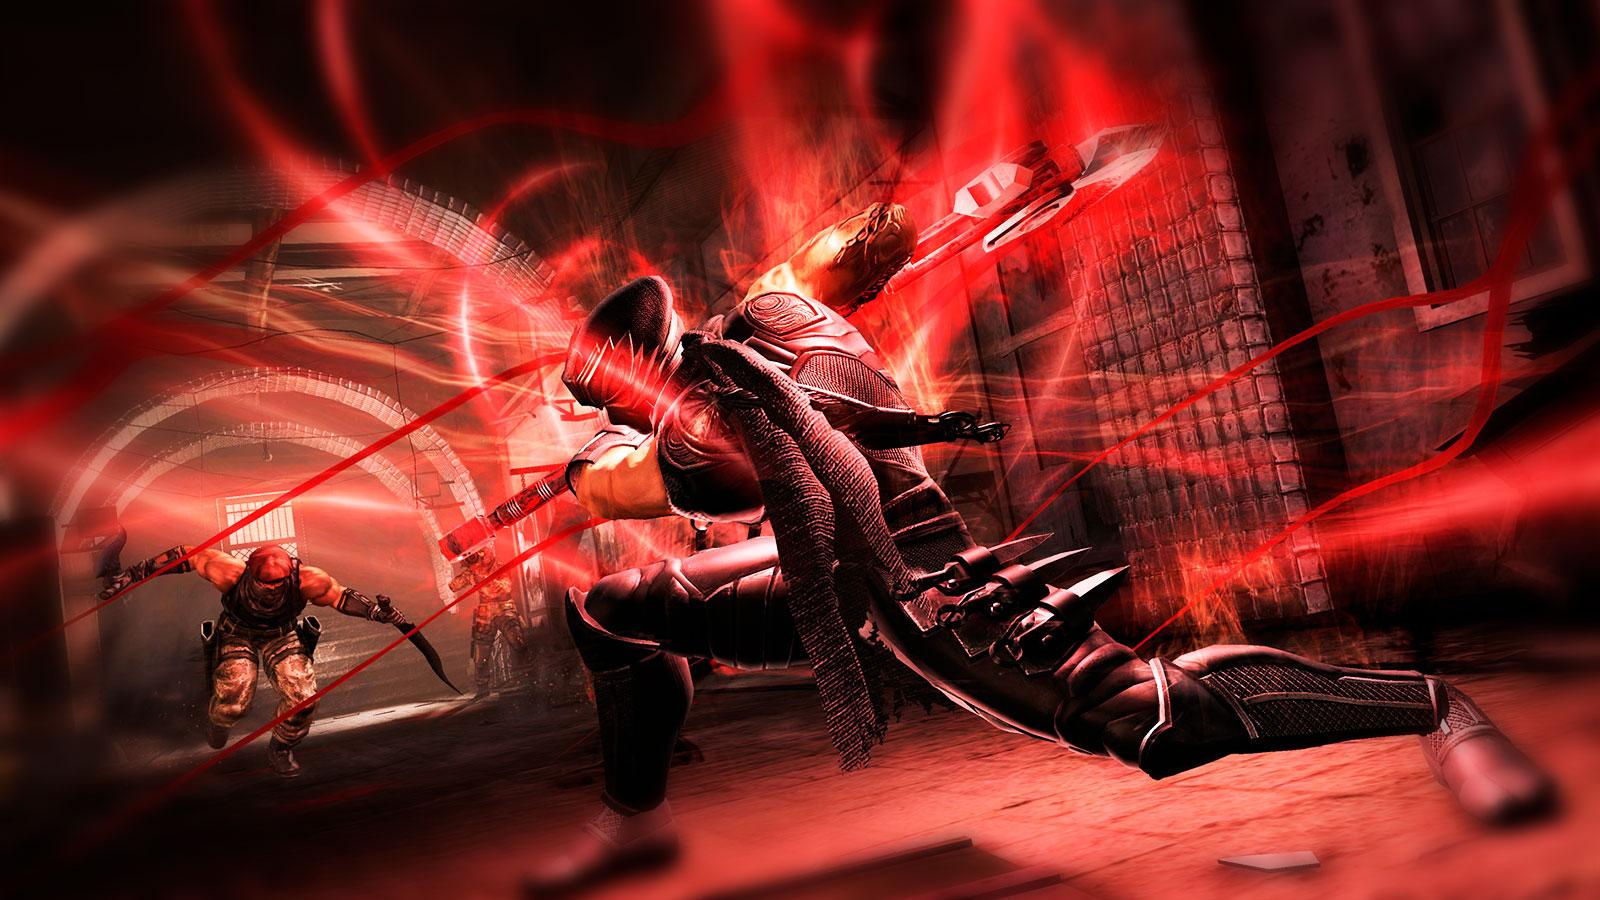 Ninja Gaiden серия игр про ниндзя